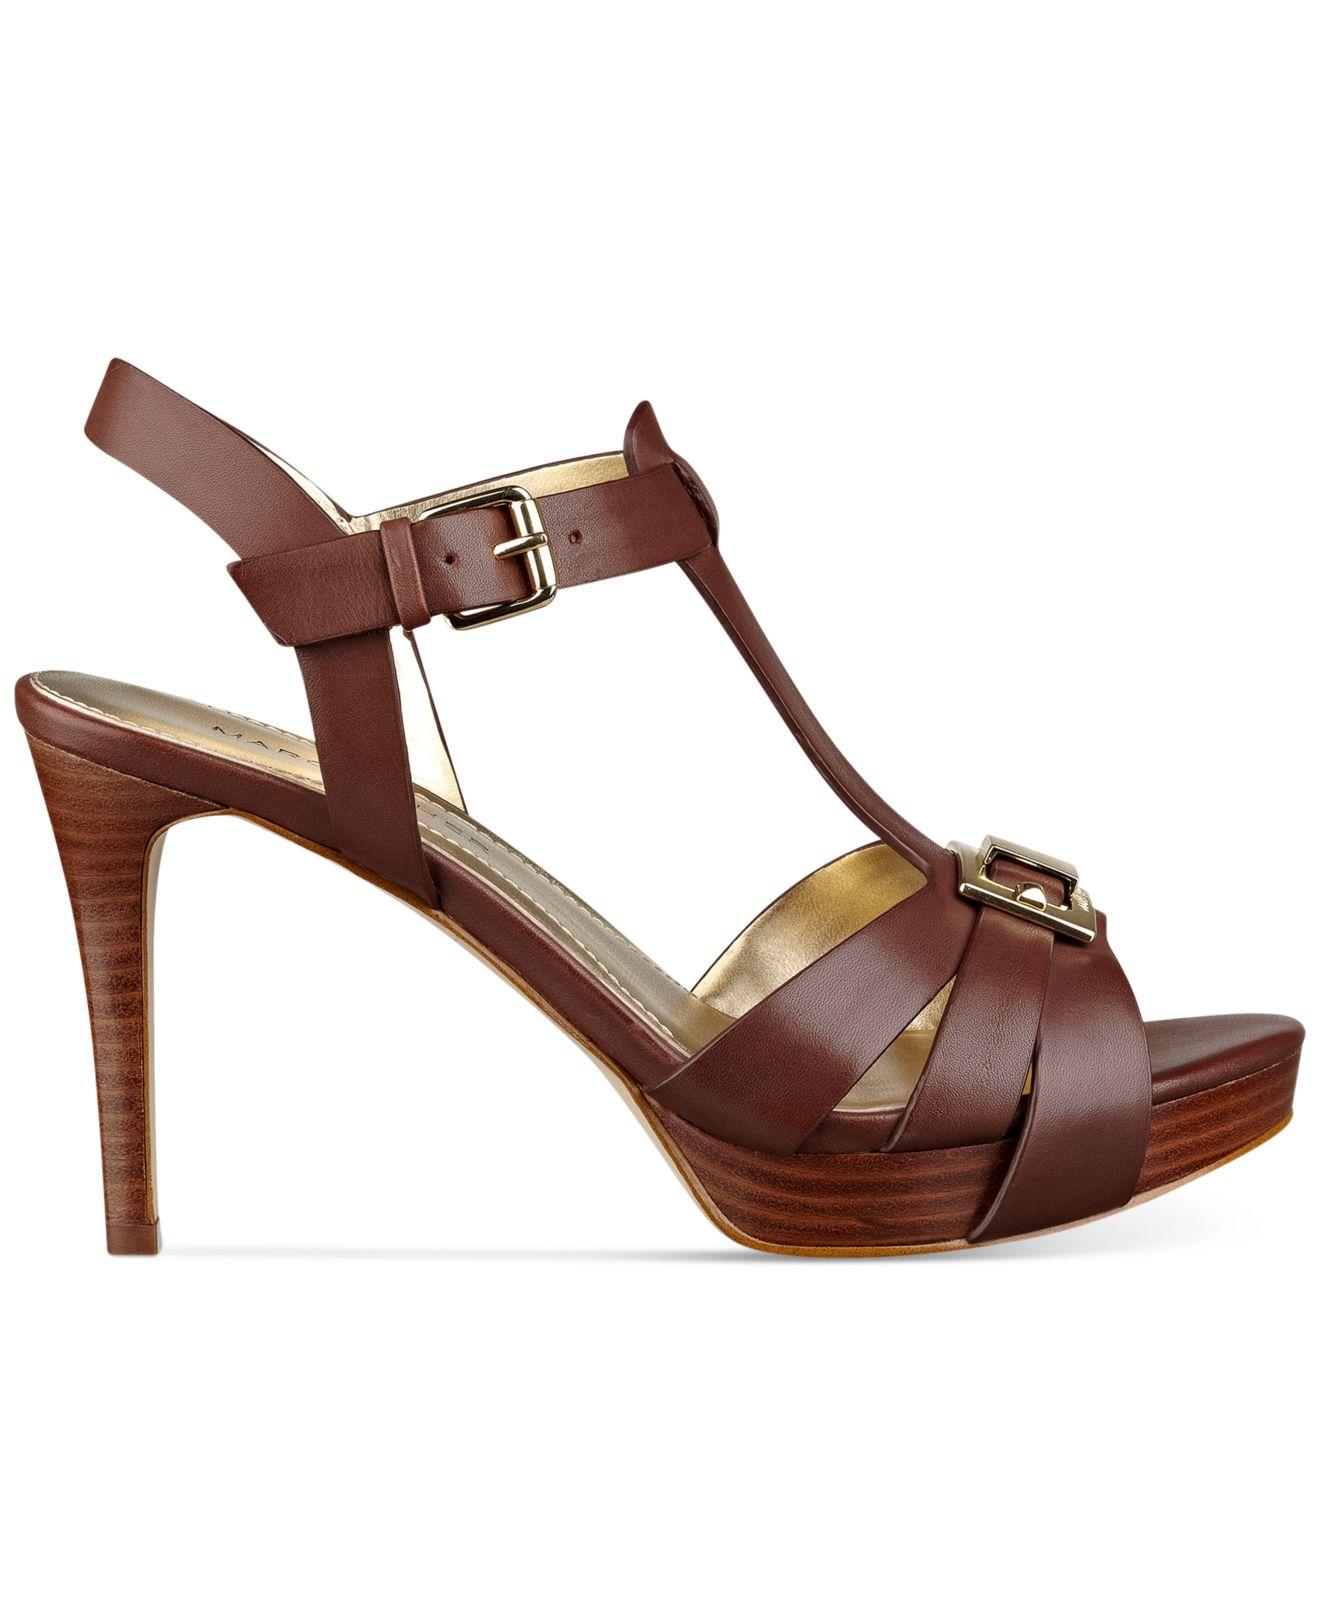 marc fisher varika mid heel platform sandals in brown lyst